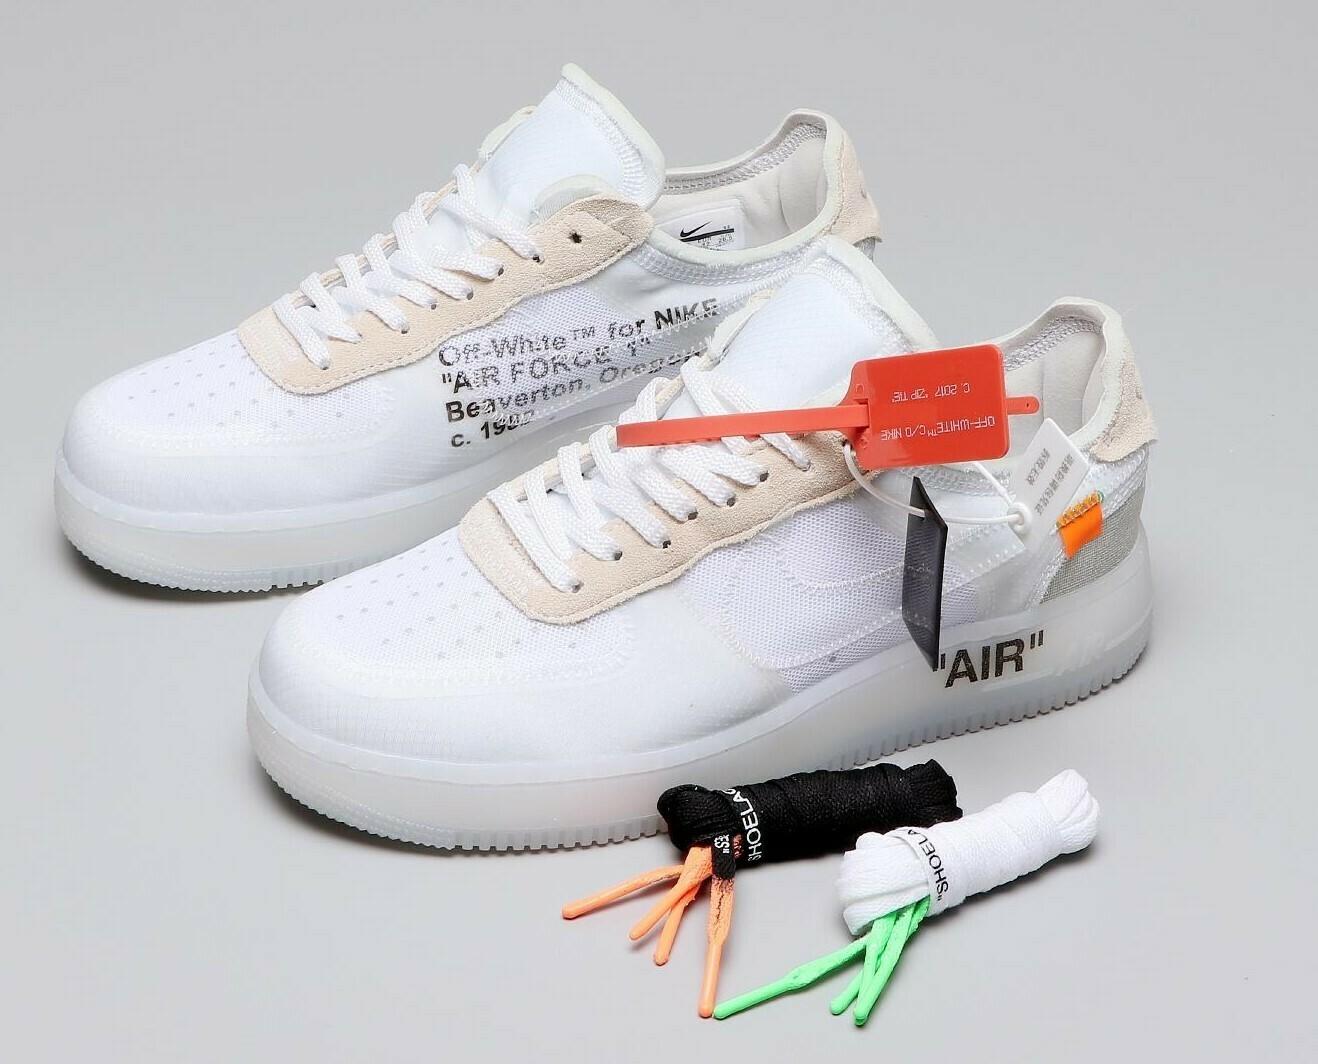 Men's/Women's Air Force 1 X OW Low ' White' Shoes